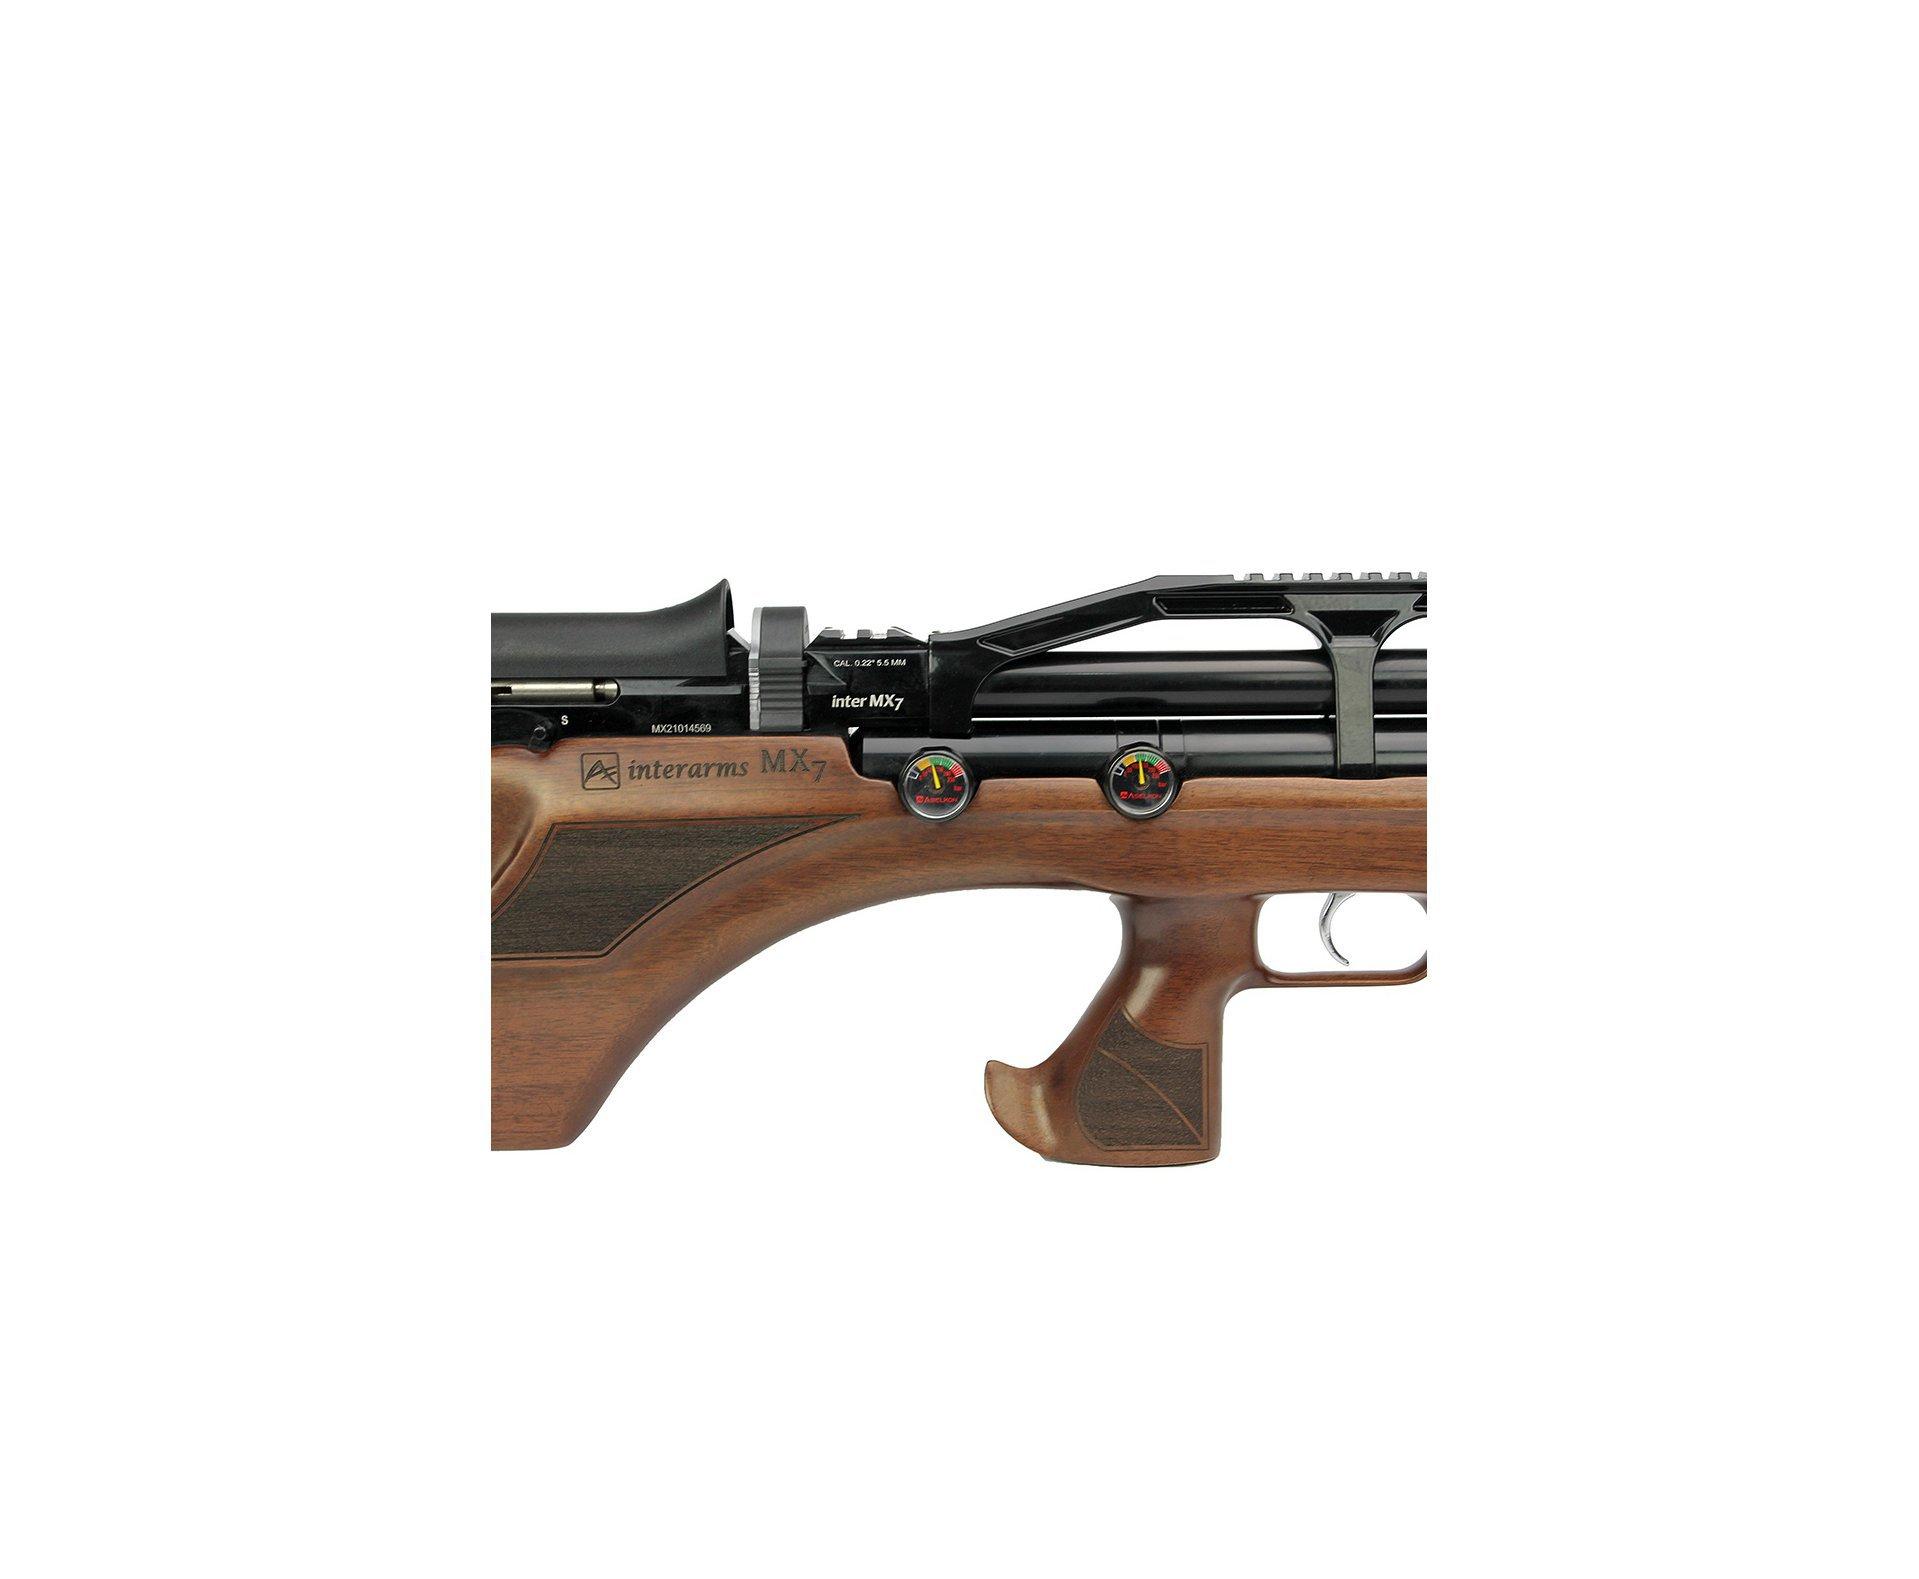 Artefato de Pressão PCP MX7 Wood Regulated 5.5mm Aselkon